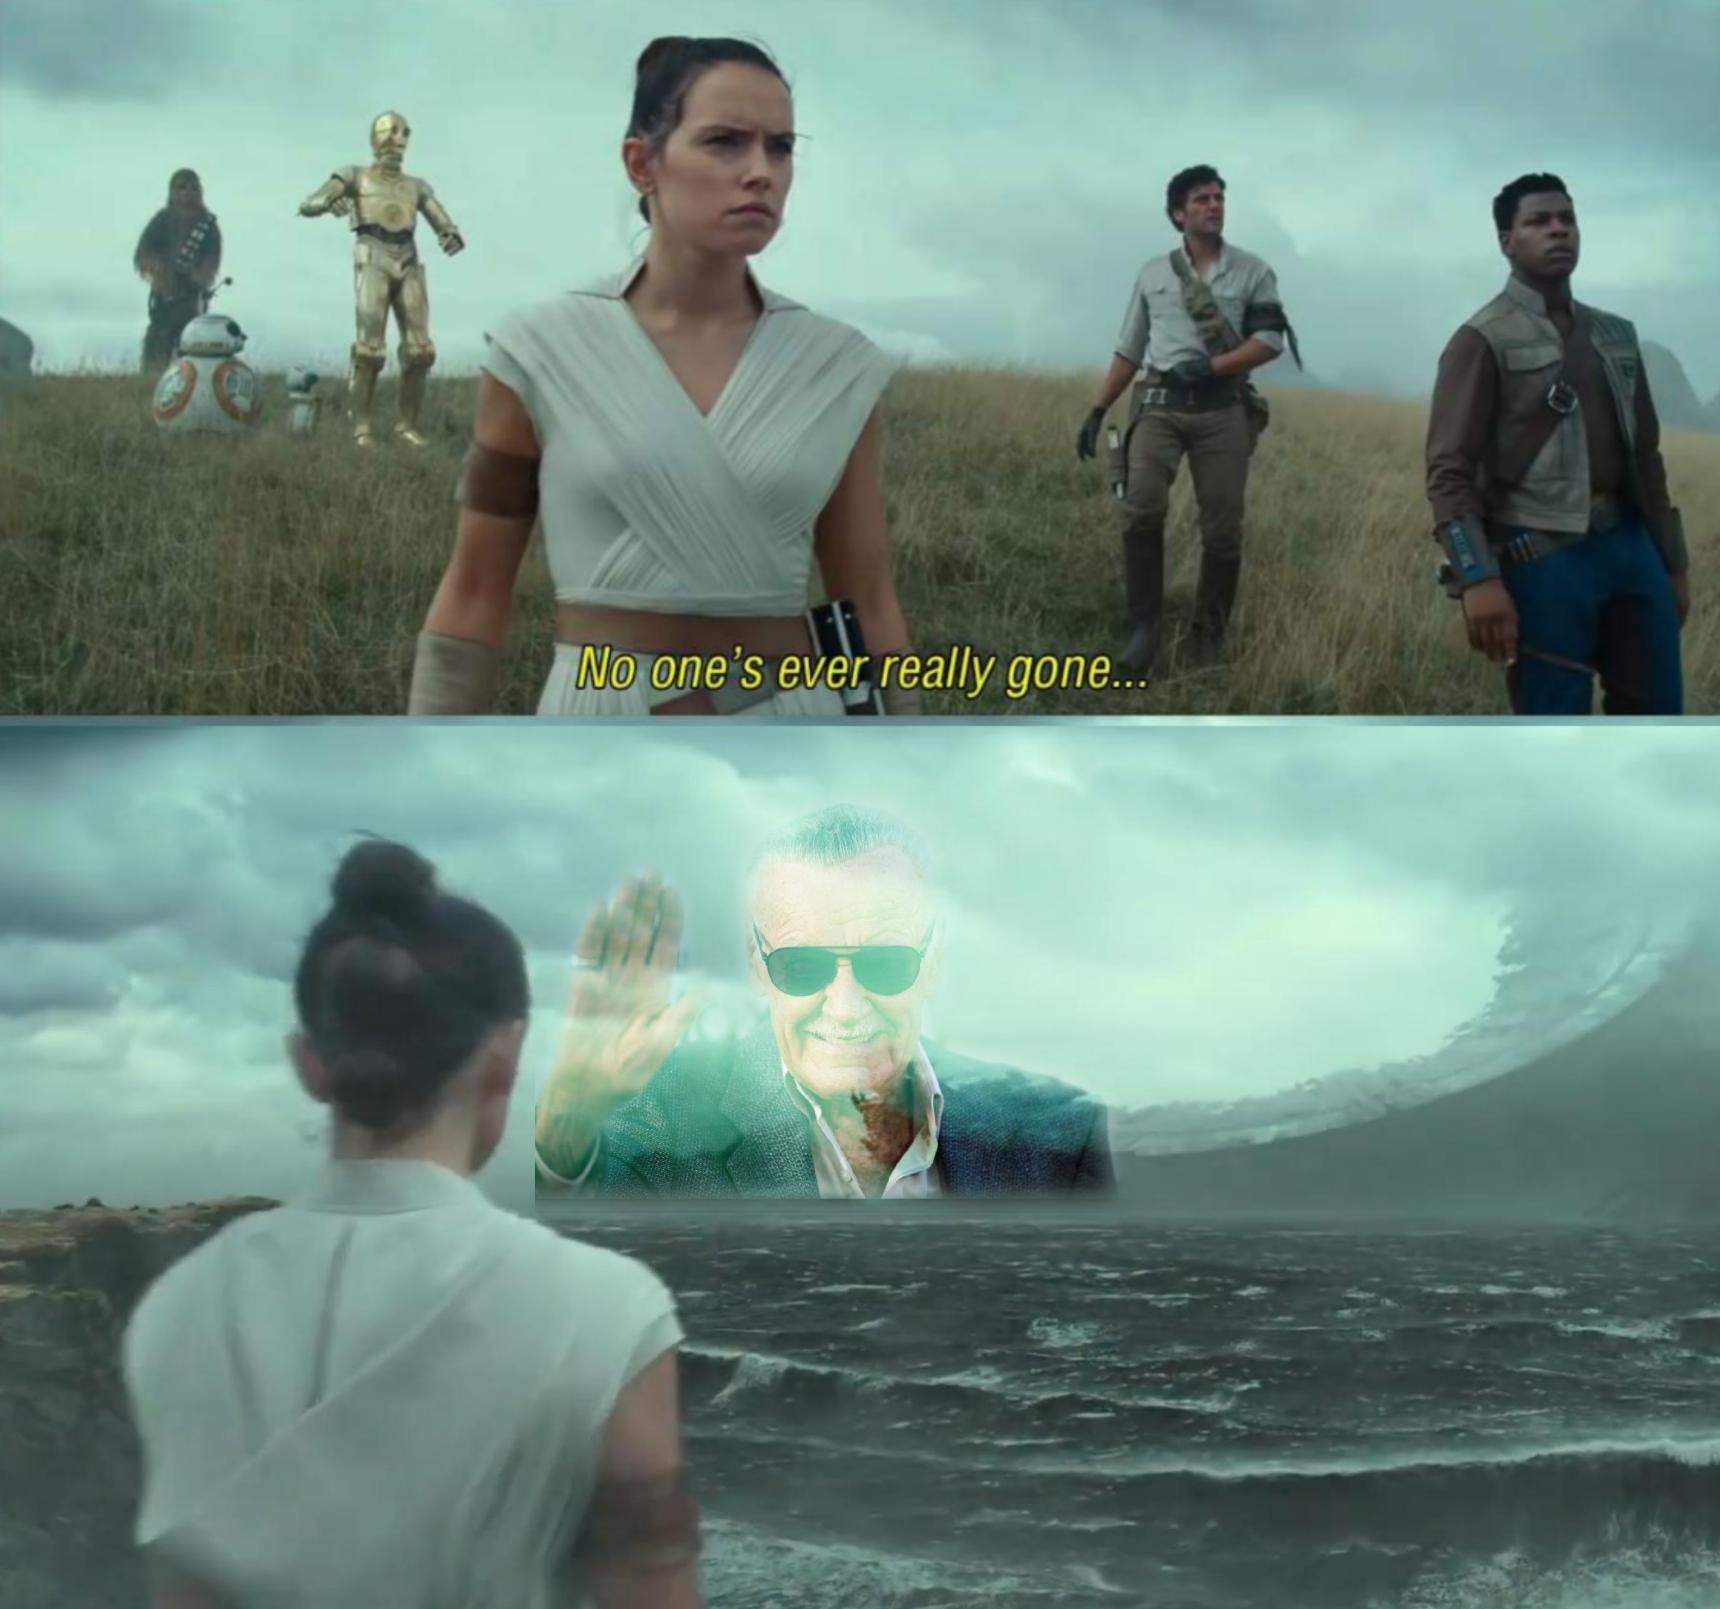 Excelsior (and F) - meme